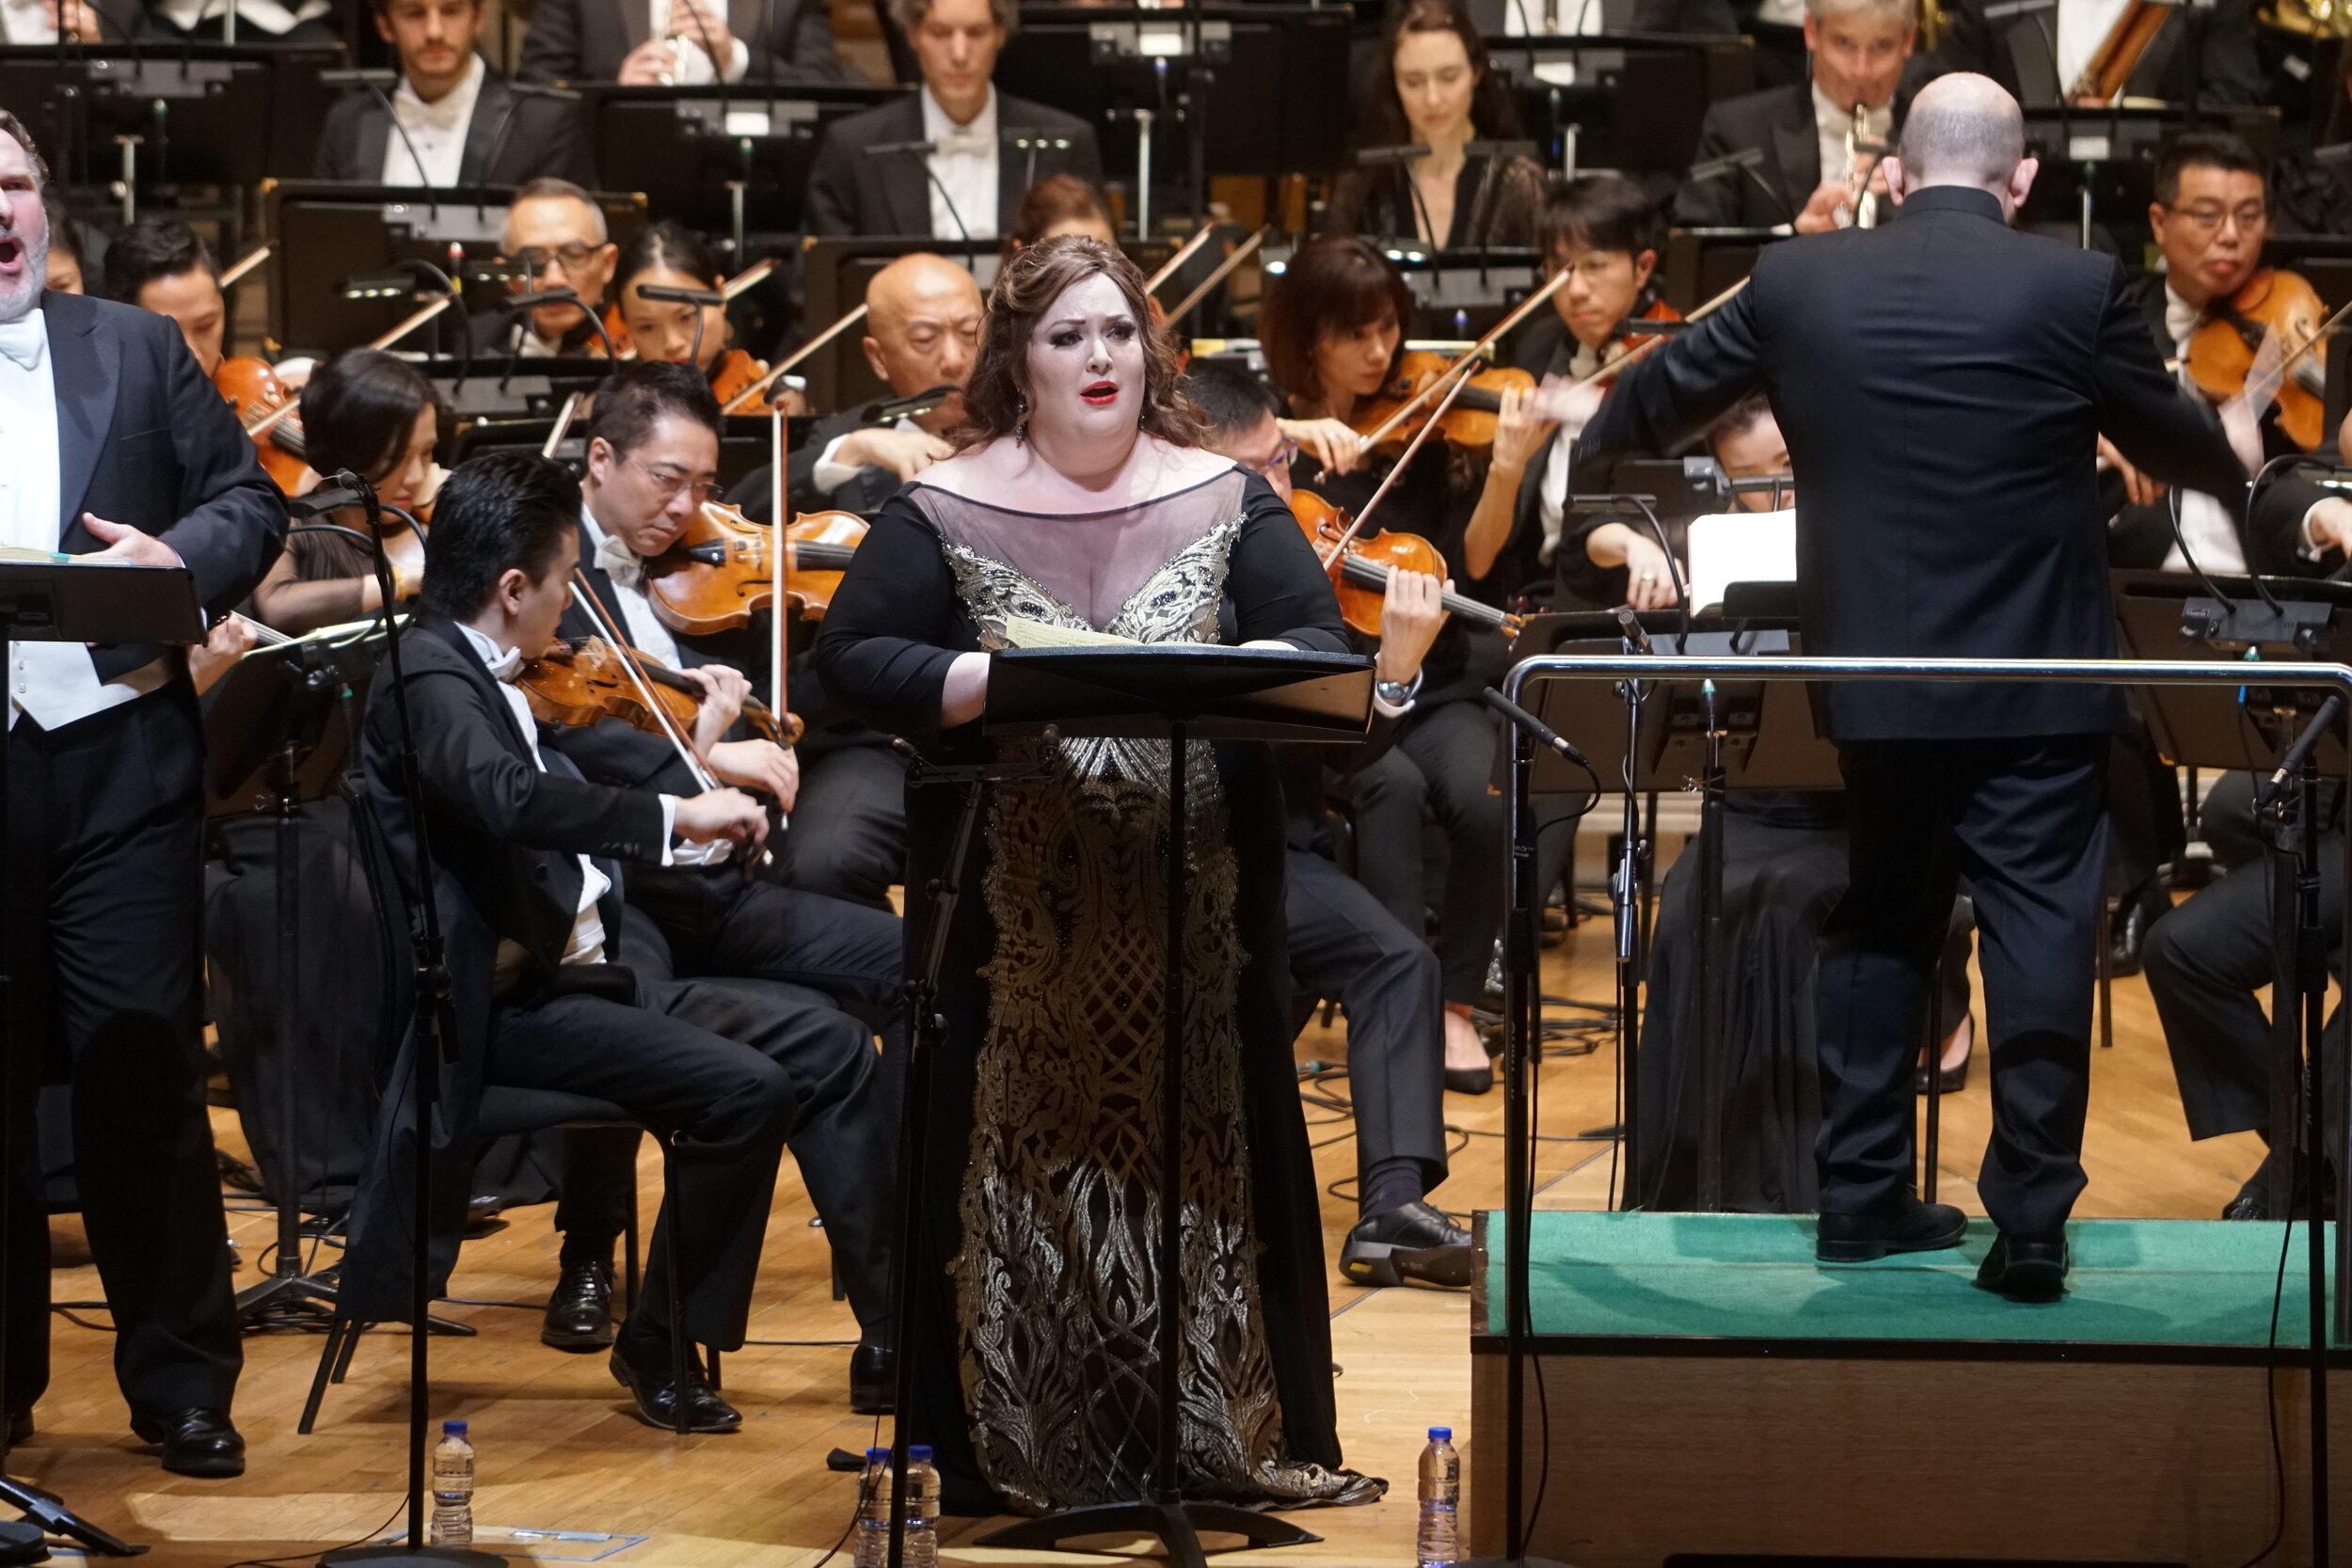 Sieglinde inDie Walküre - Quad City Symphony Orchestra7, 8 December 2019